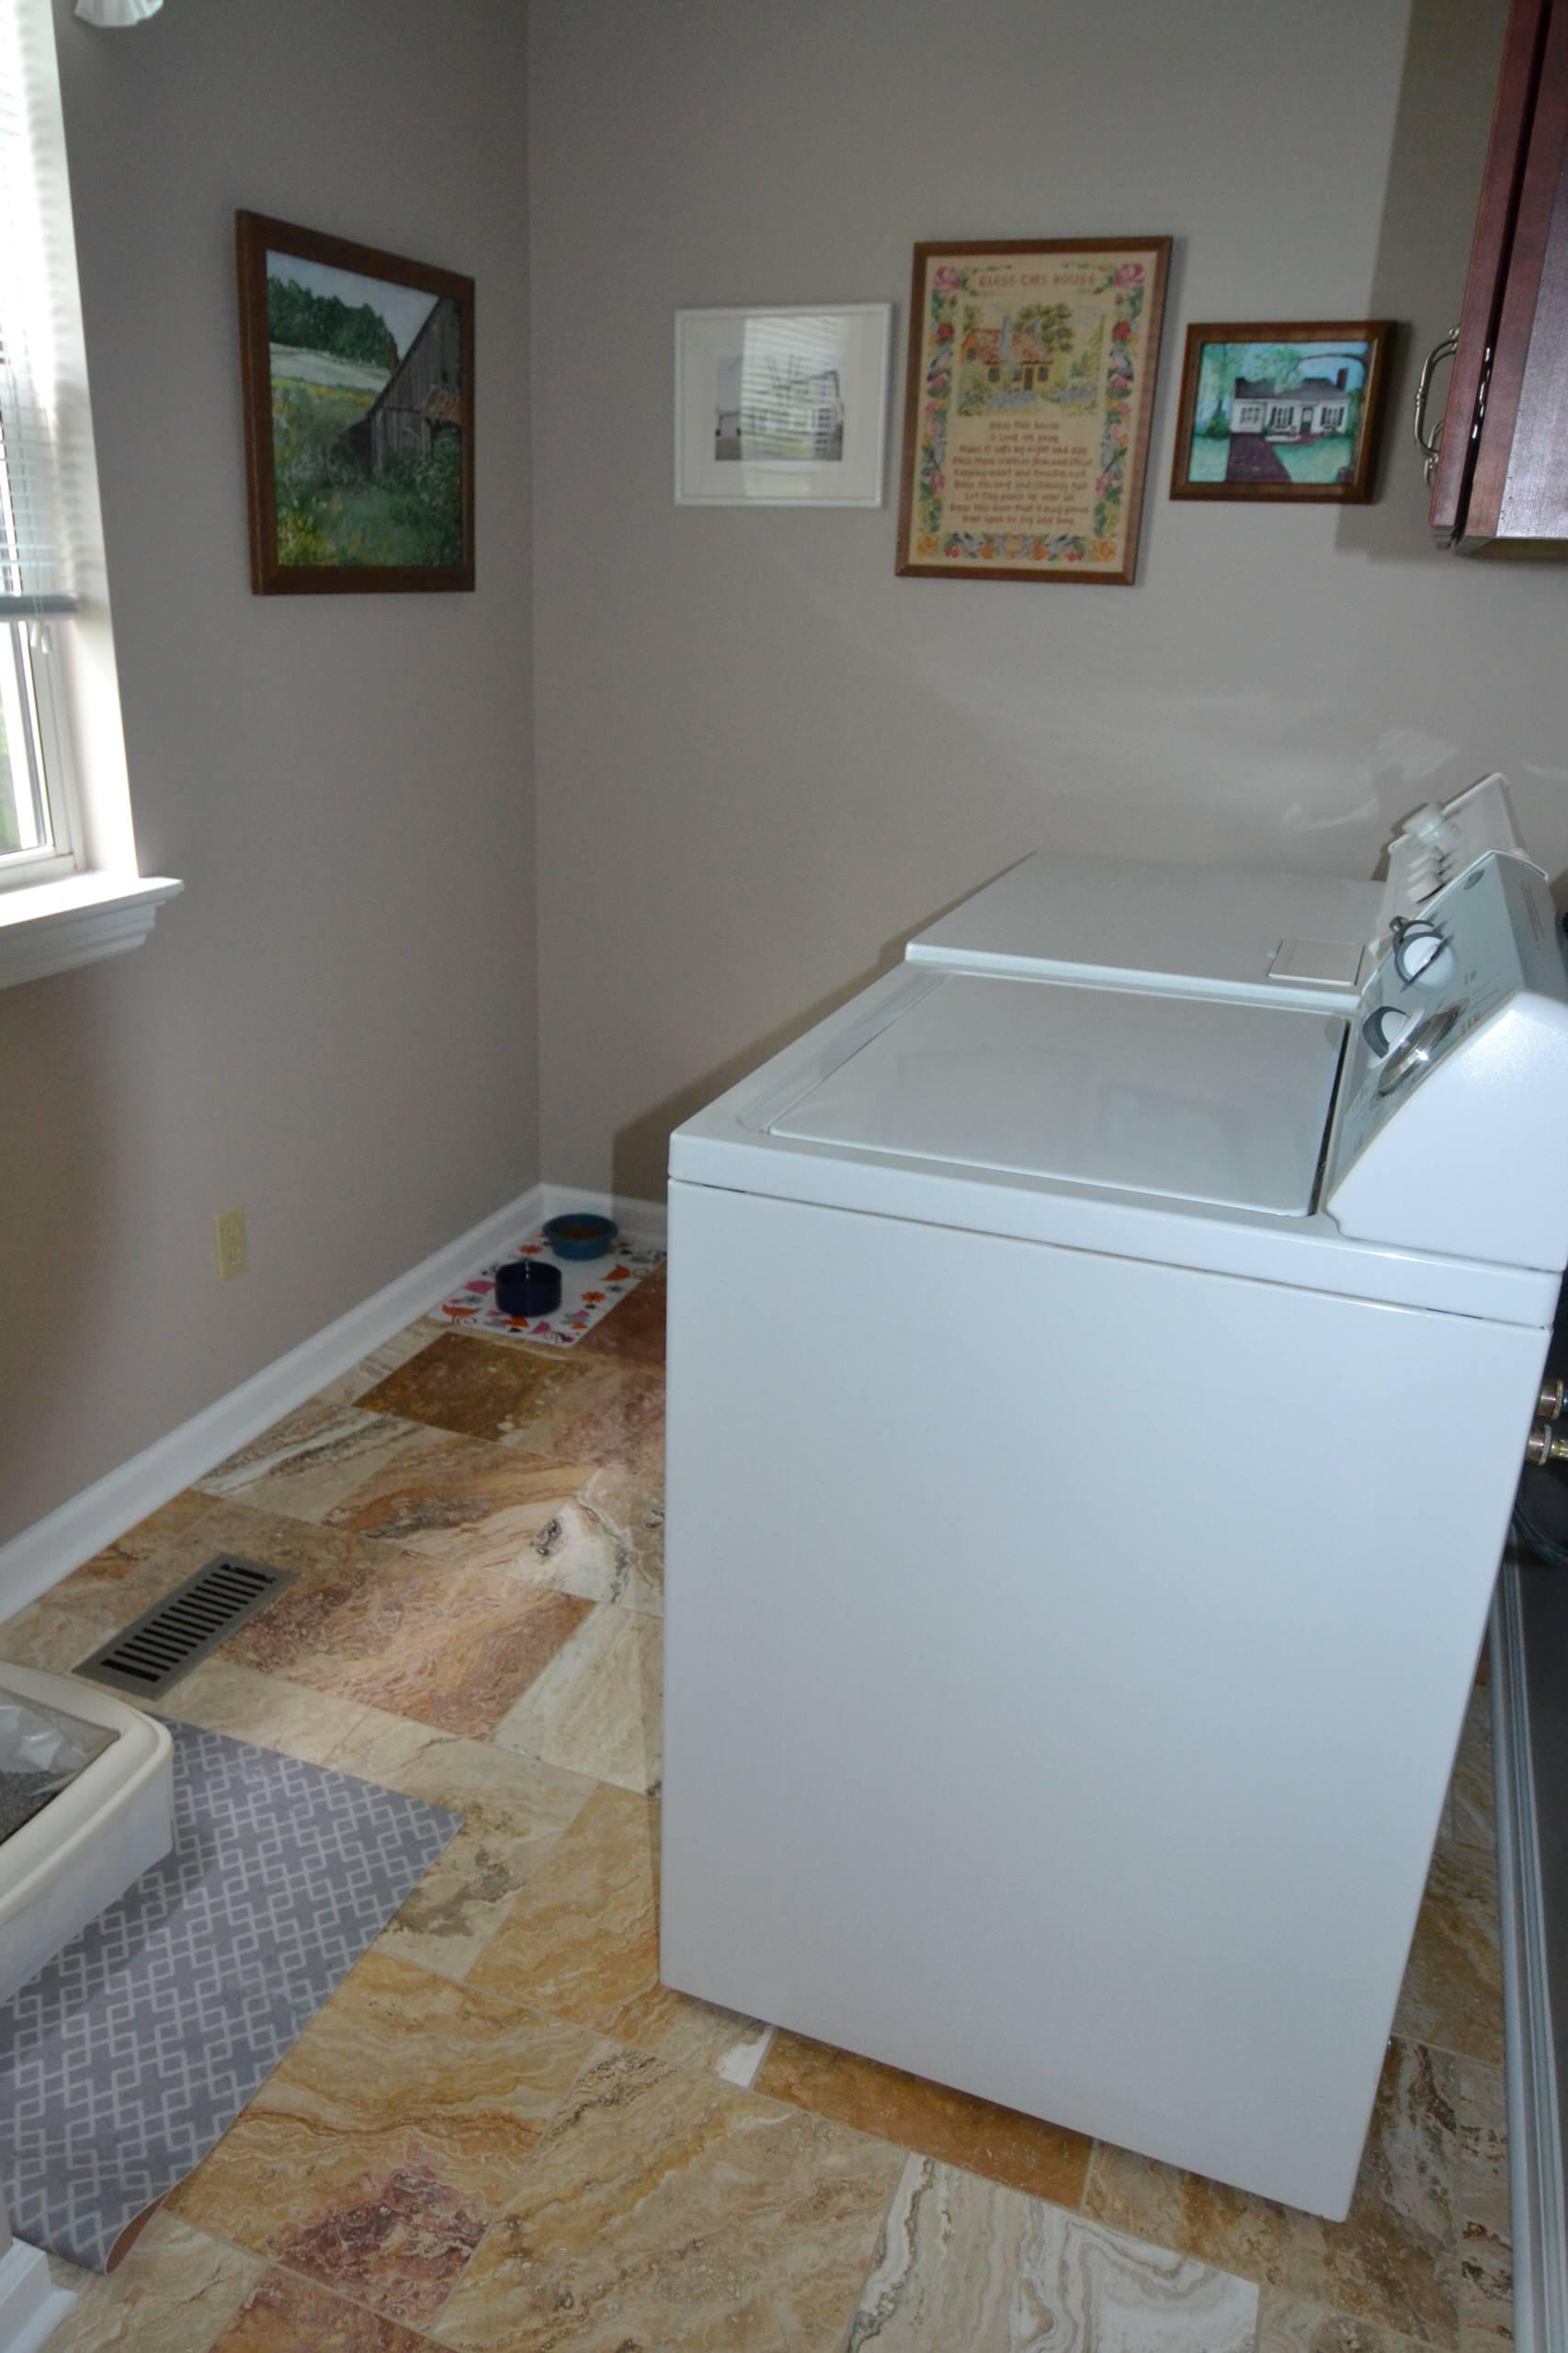 Hellwege powder/laundry room